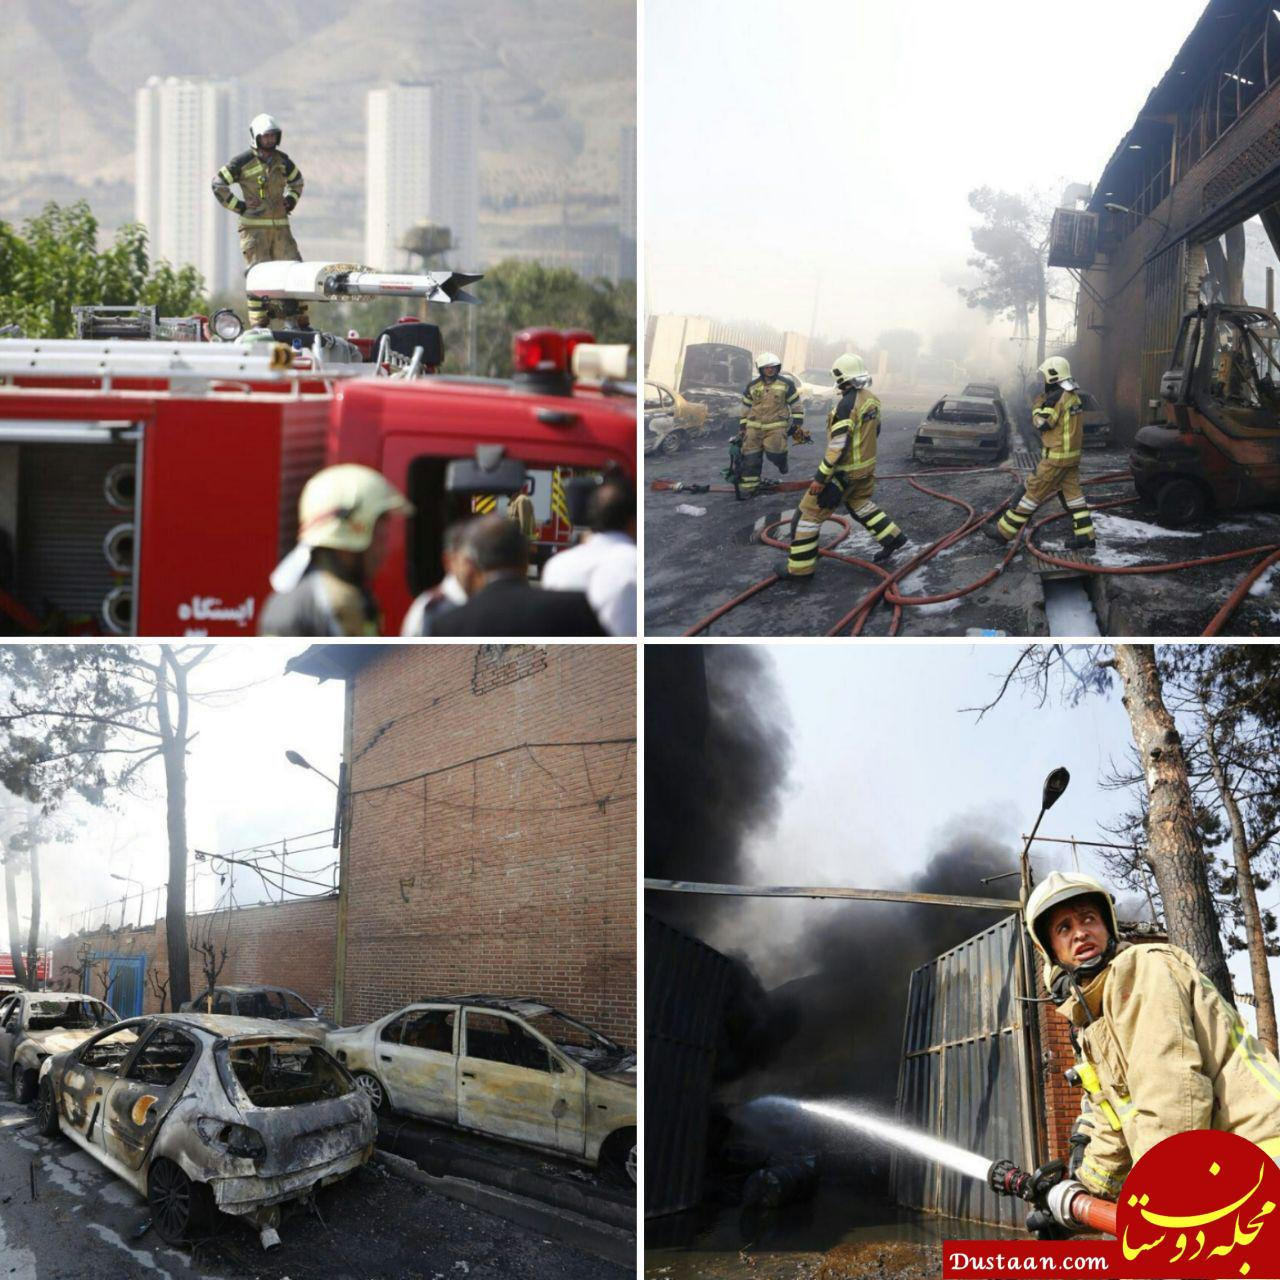 www.dustaan.com تصاویر: حادثه آتش سوزی کارخانه 2 هزار متری تولید رنگ و مواد شیمیایی